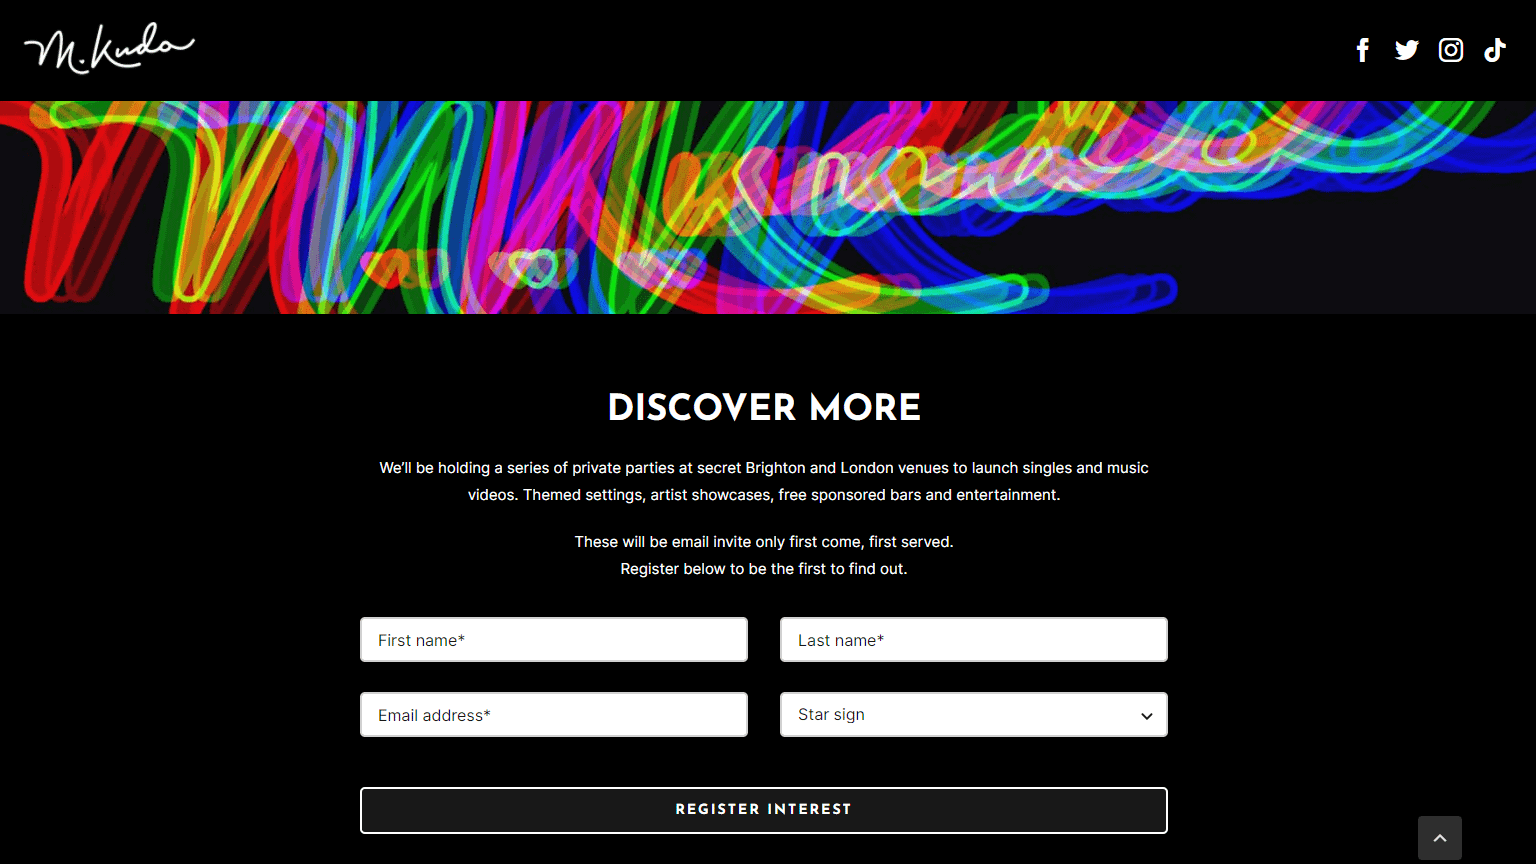 golivenow.uk website design M Kudo Music screenshot 3 - golivenow.uk